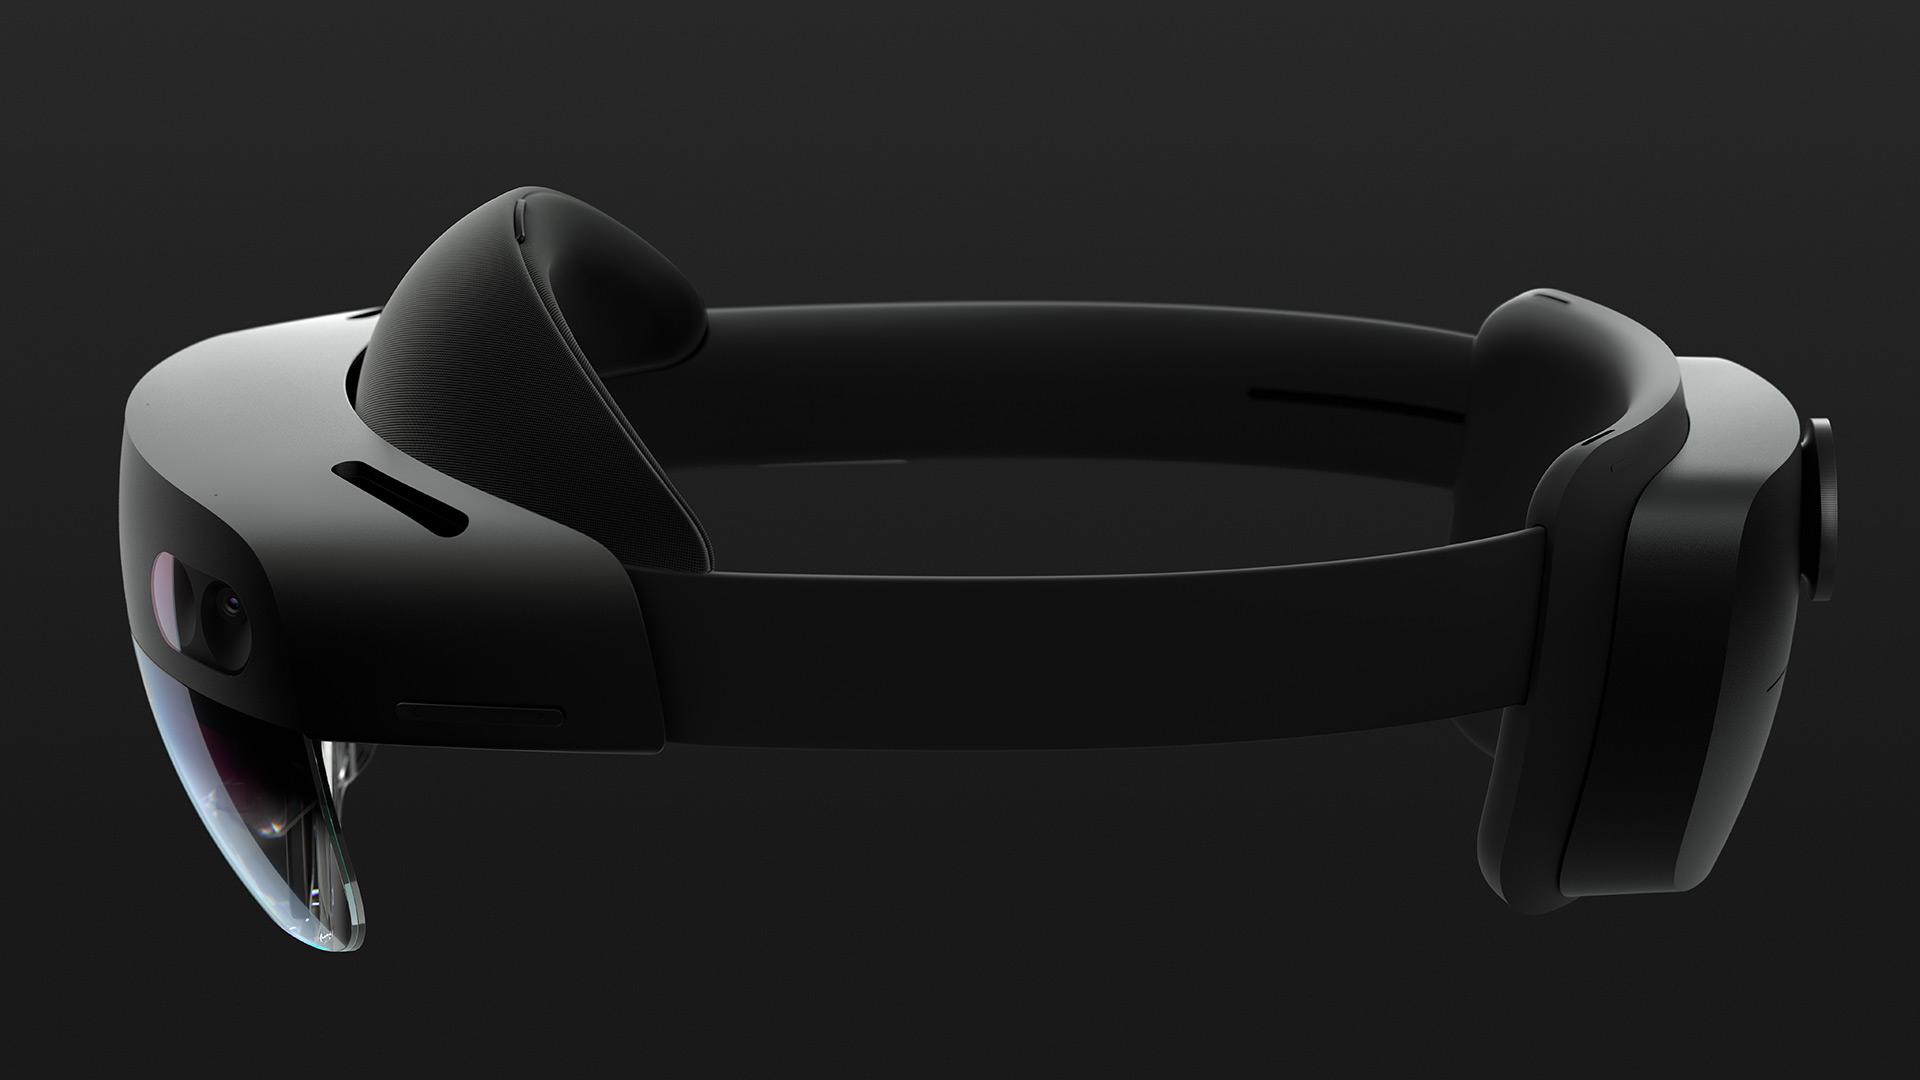 Okulary Microsoft HoloLens 2 (źródło: Microsoft)